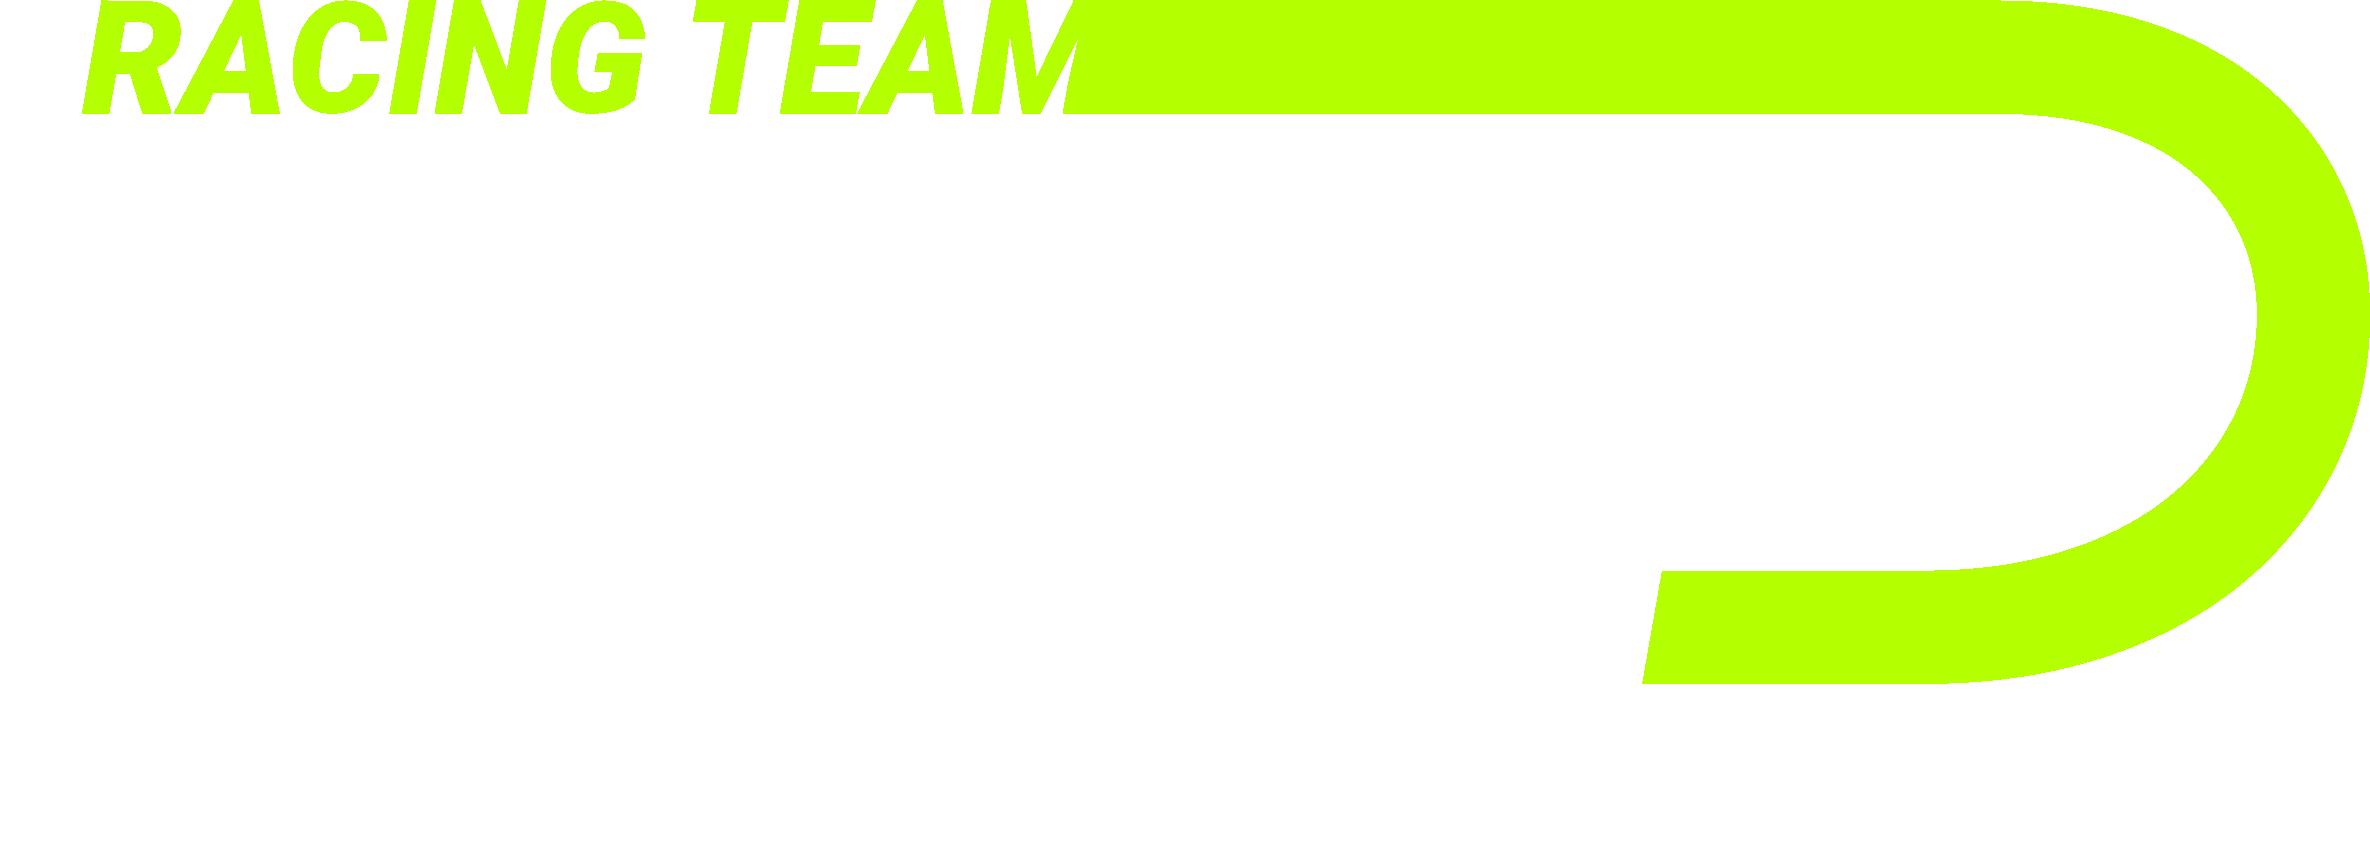 EGP Racing Team white